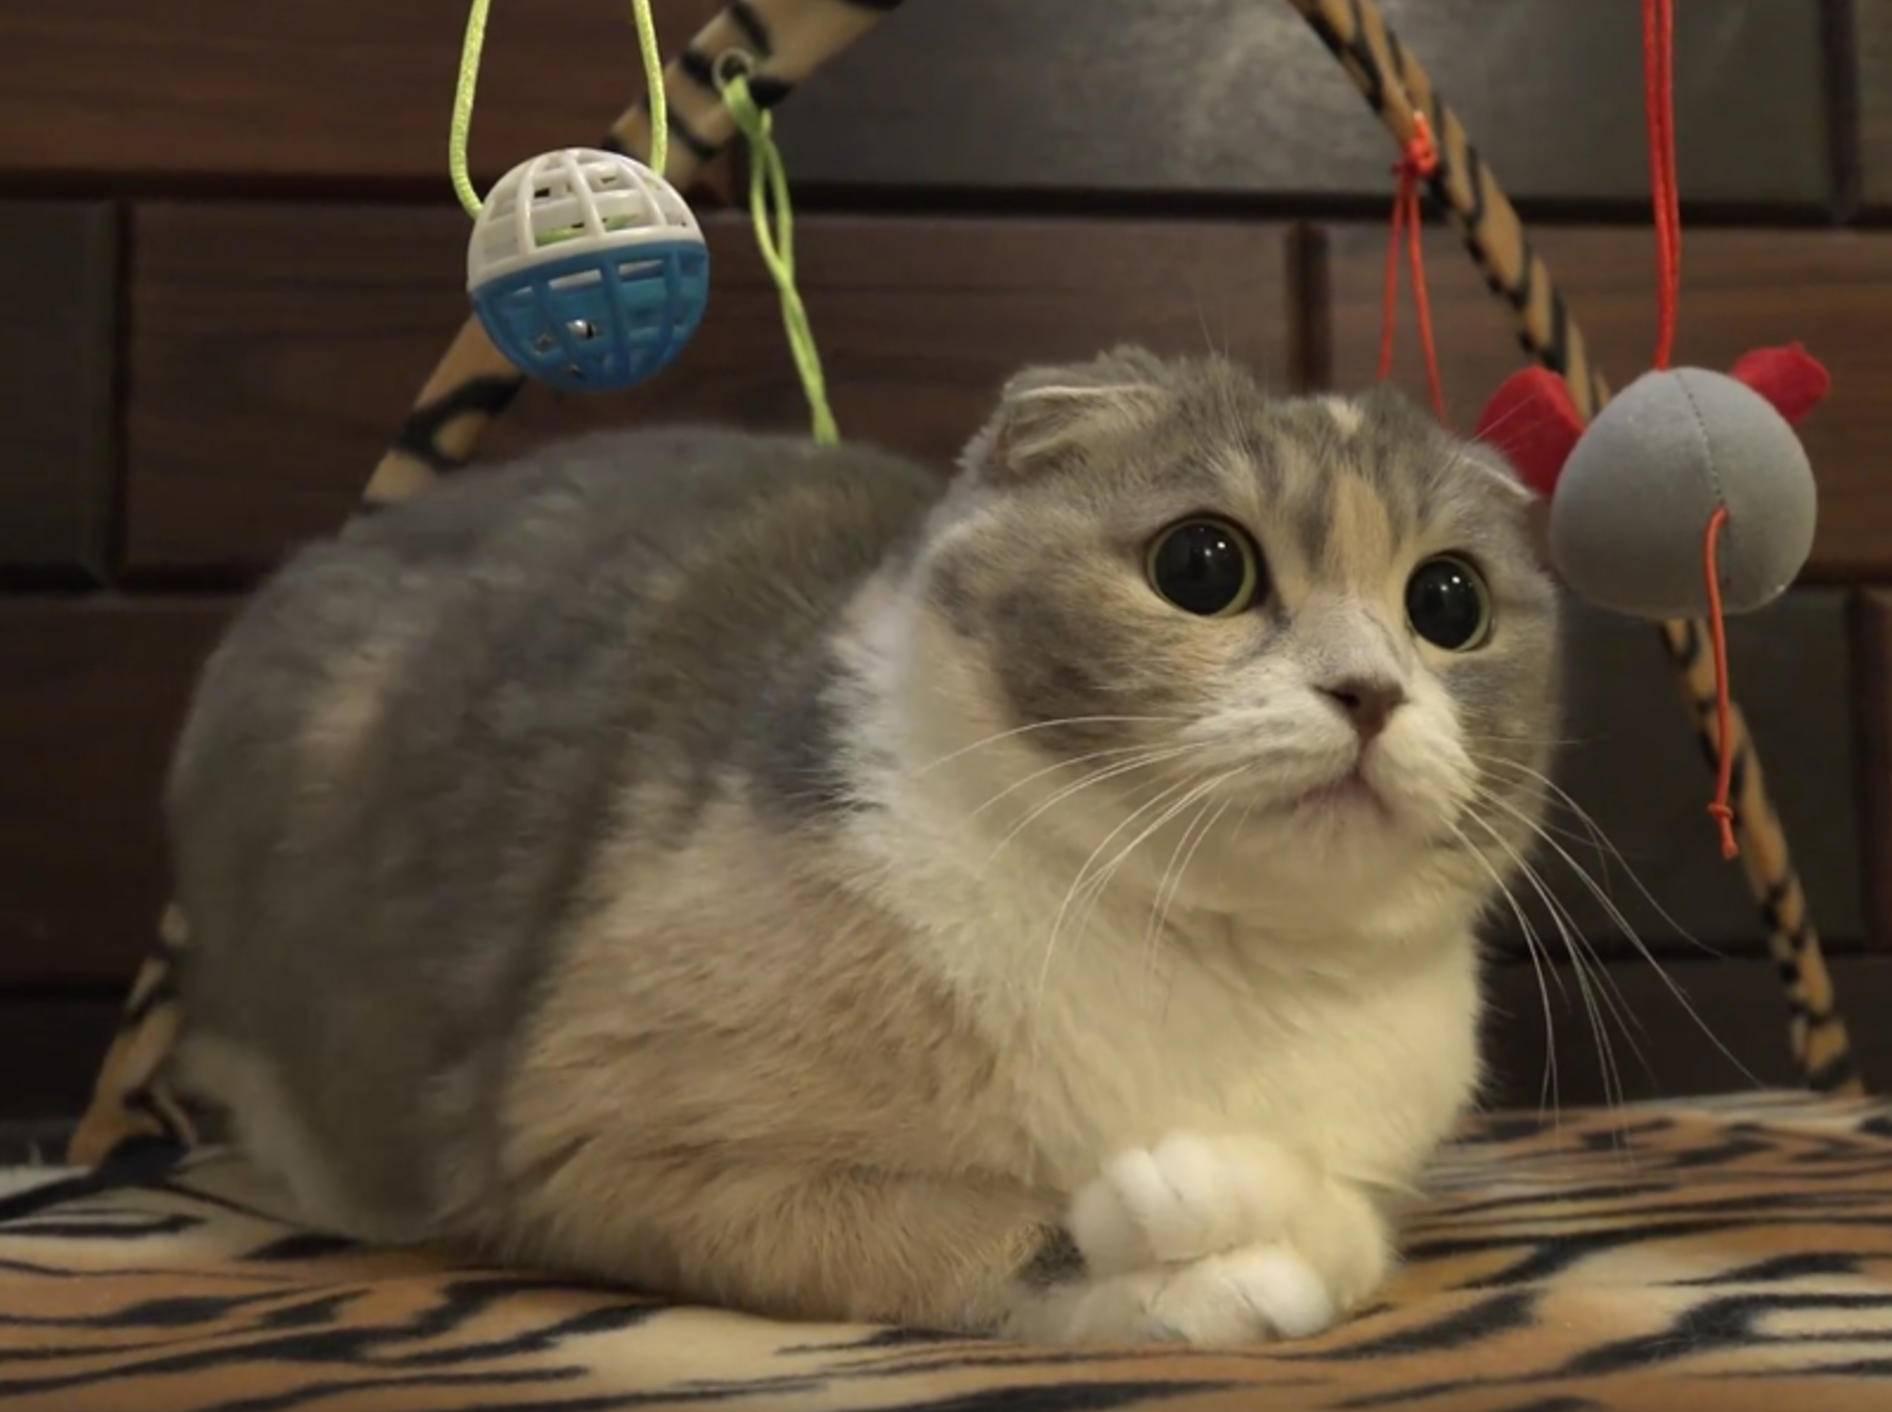 Katze Mu hat Hummeln im Hintern – YouTube / 10 Cats